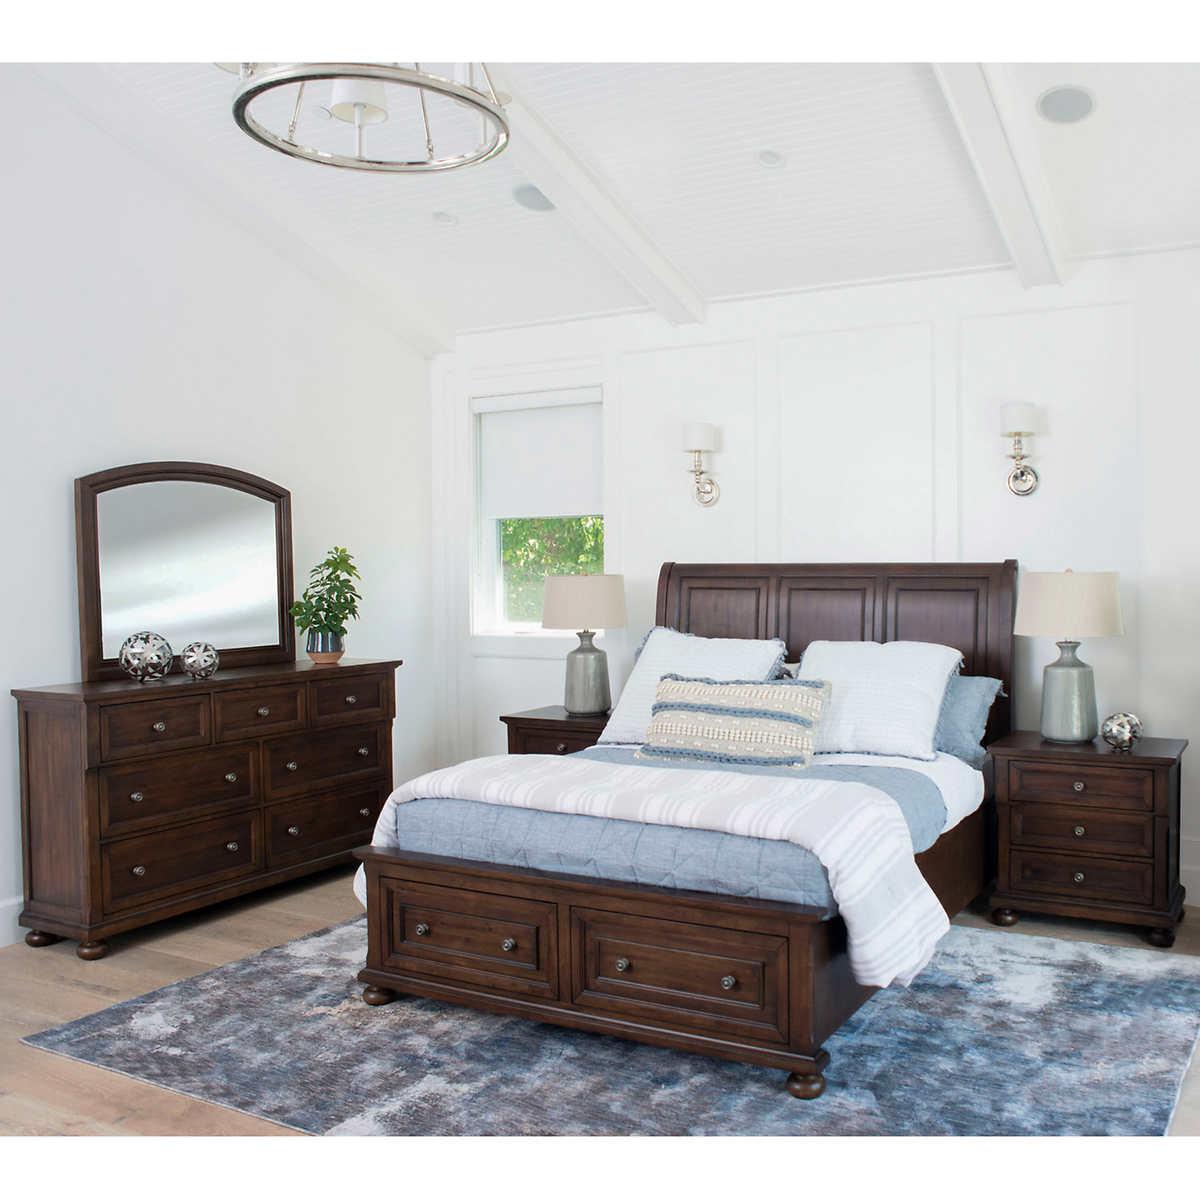 Lawson 3-piece Queen Bedroom Set